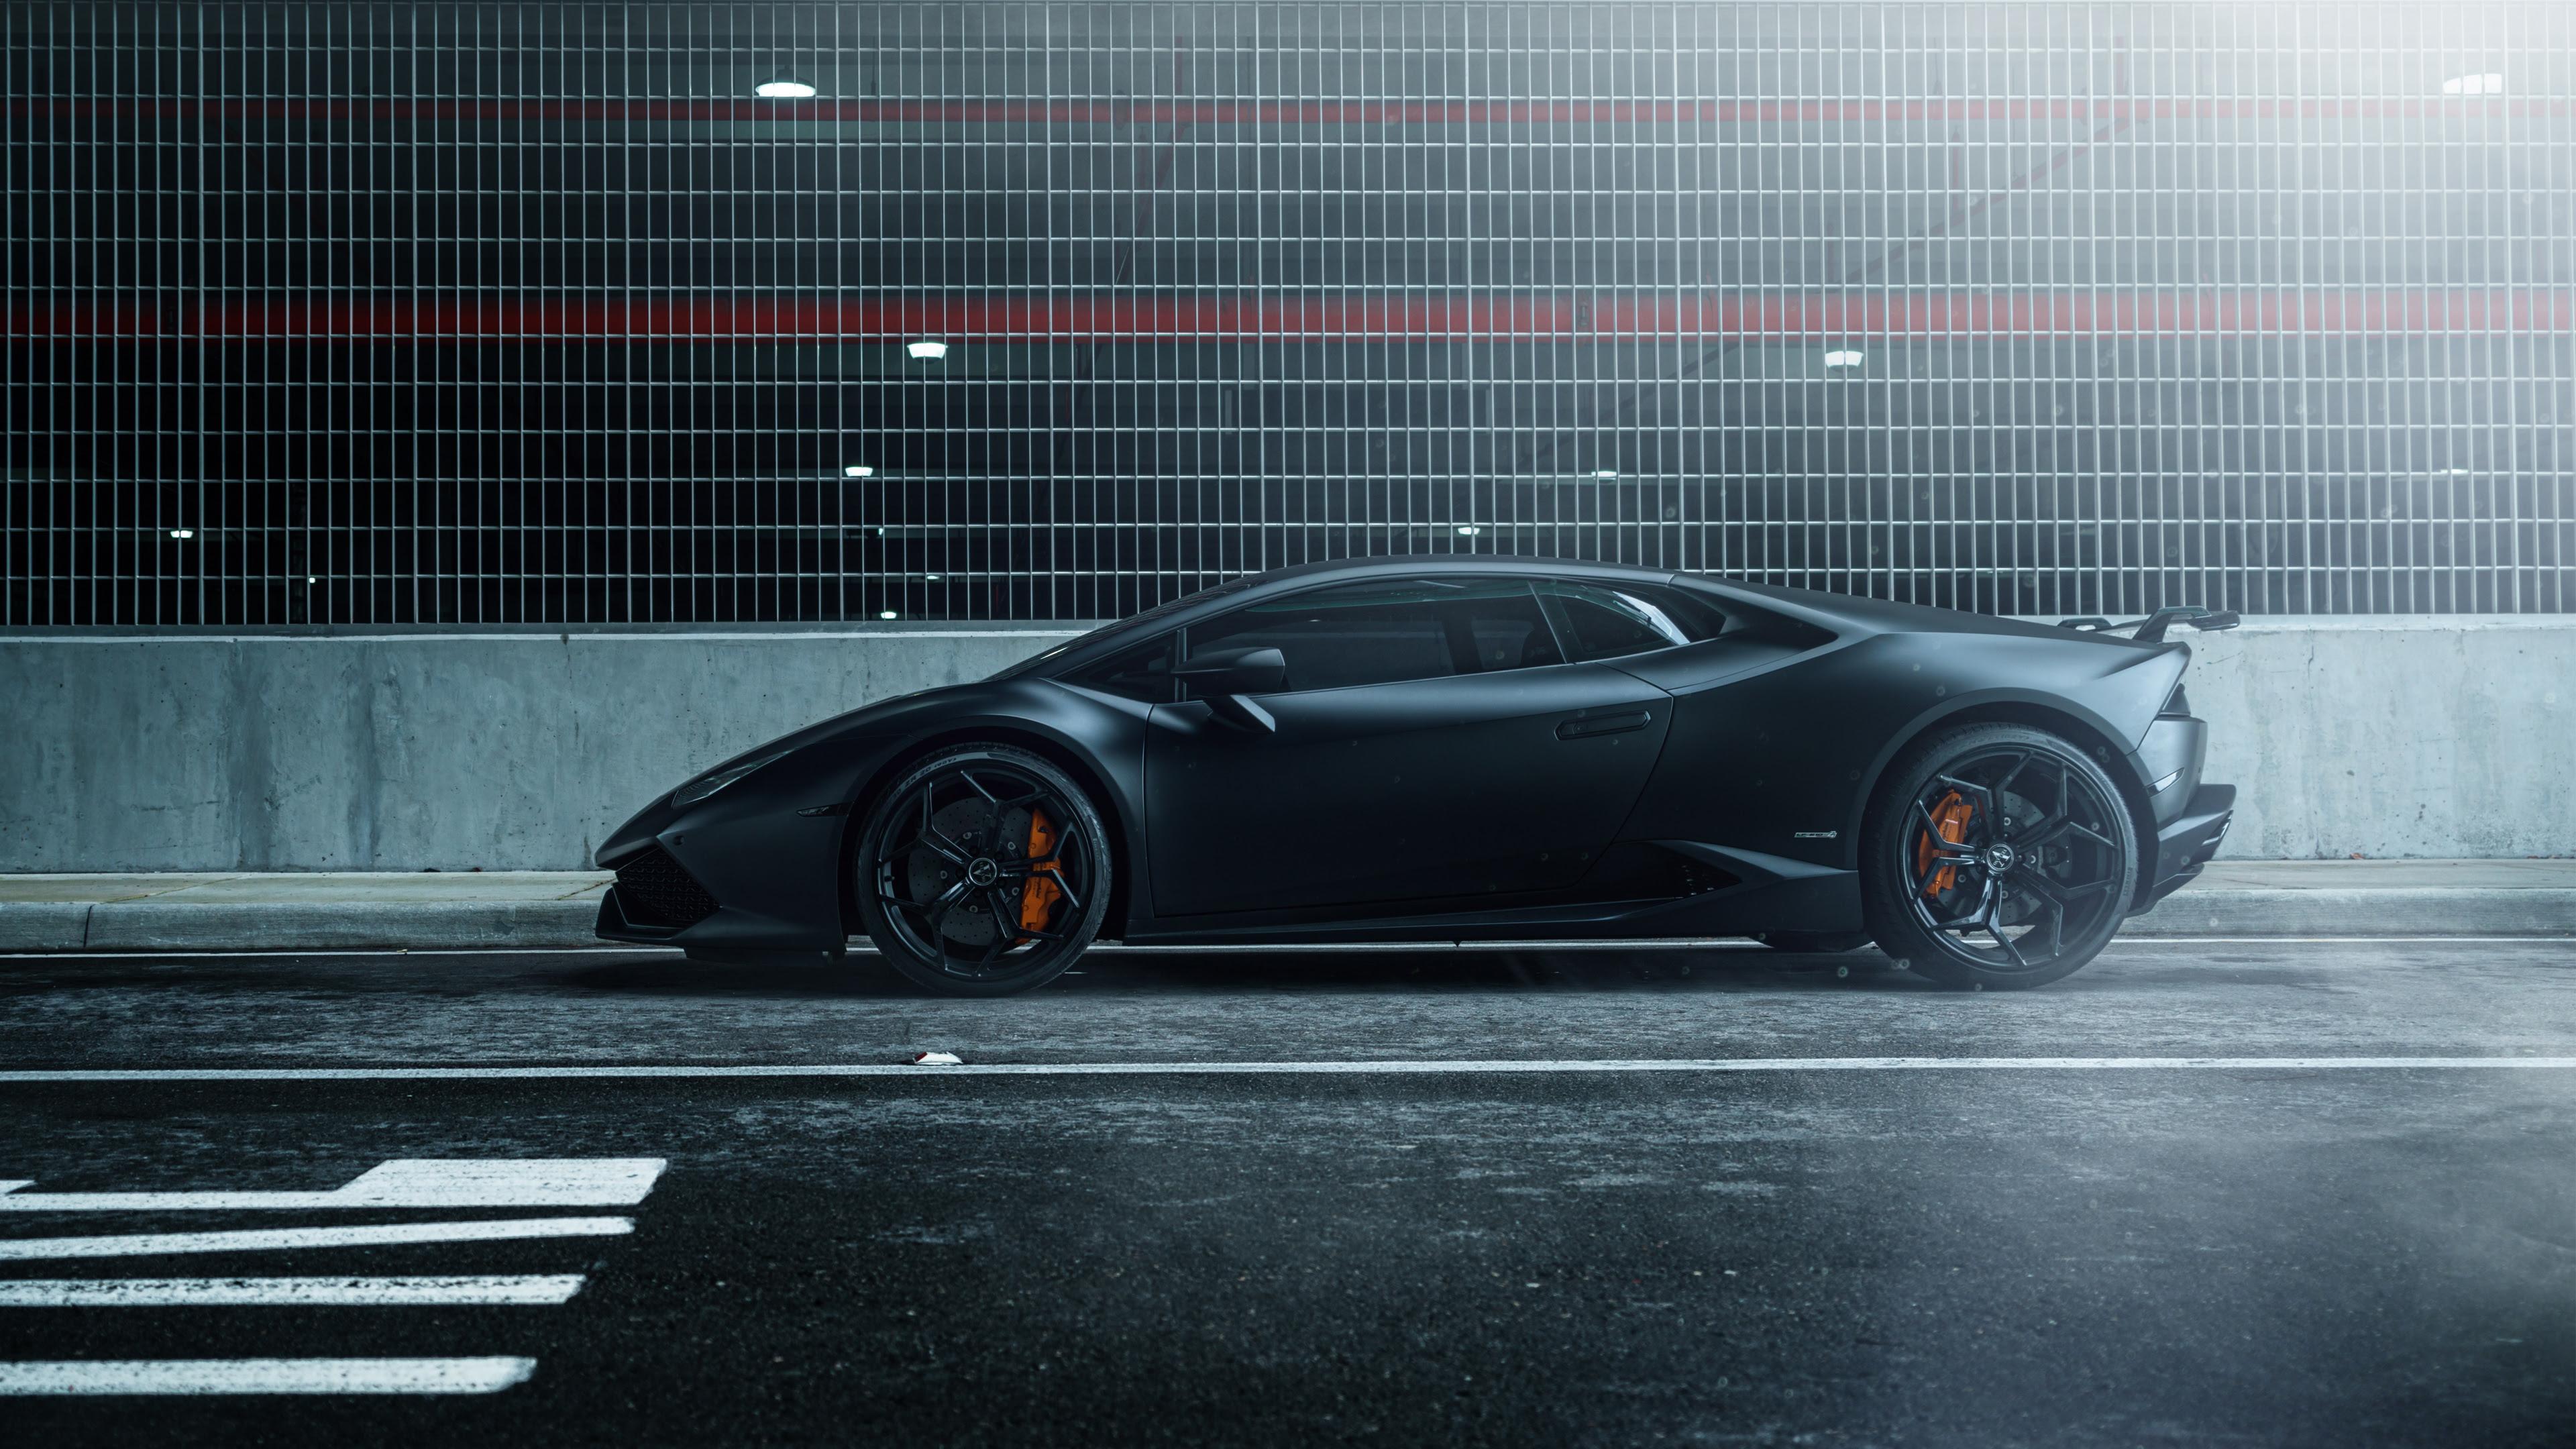 Lamborghini Huracan Vellano MC Matte Black 4K Wallpaper  HD Car Wallpapers  ID 6399